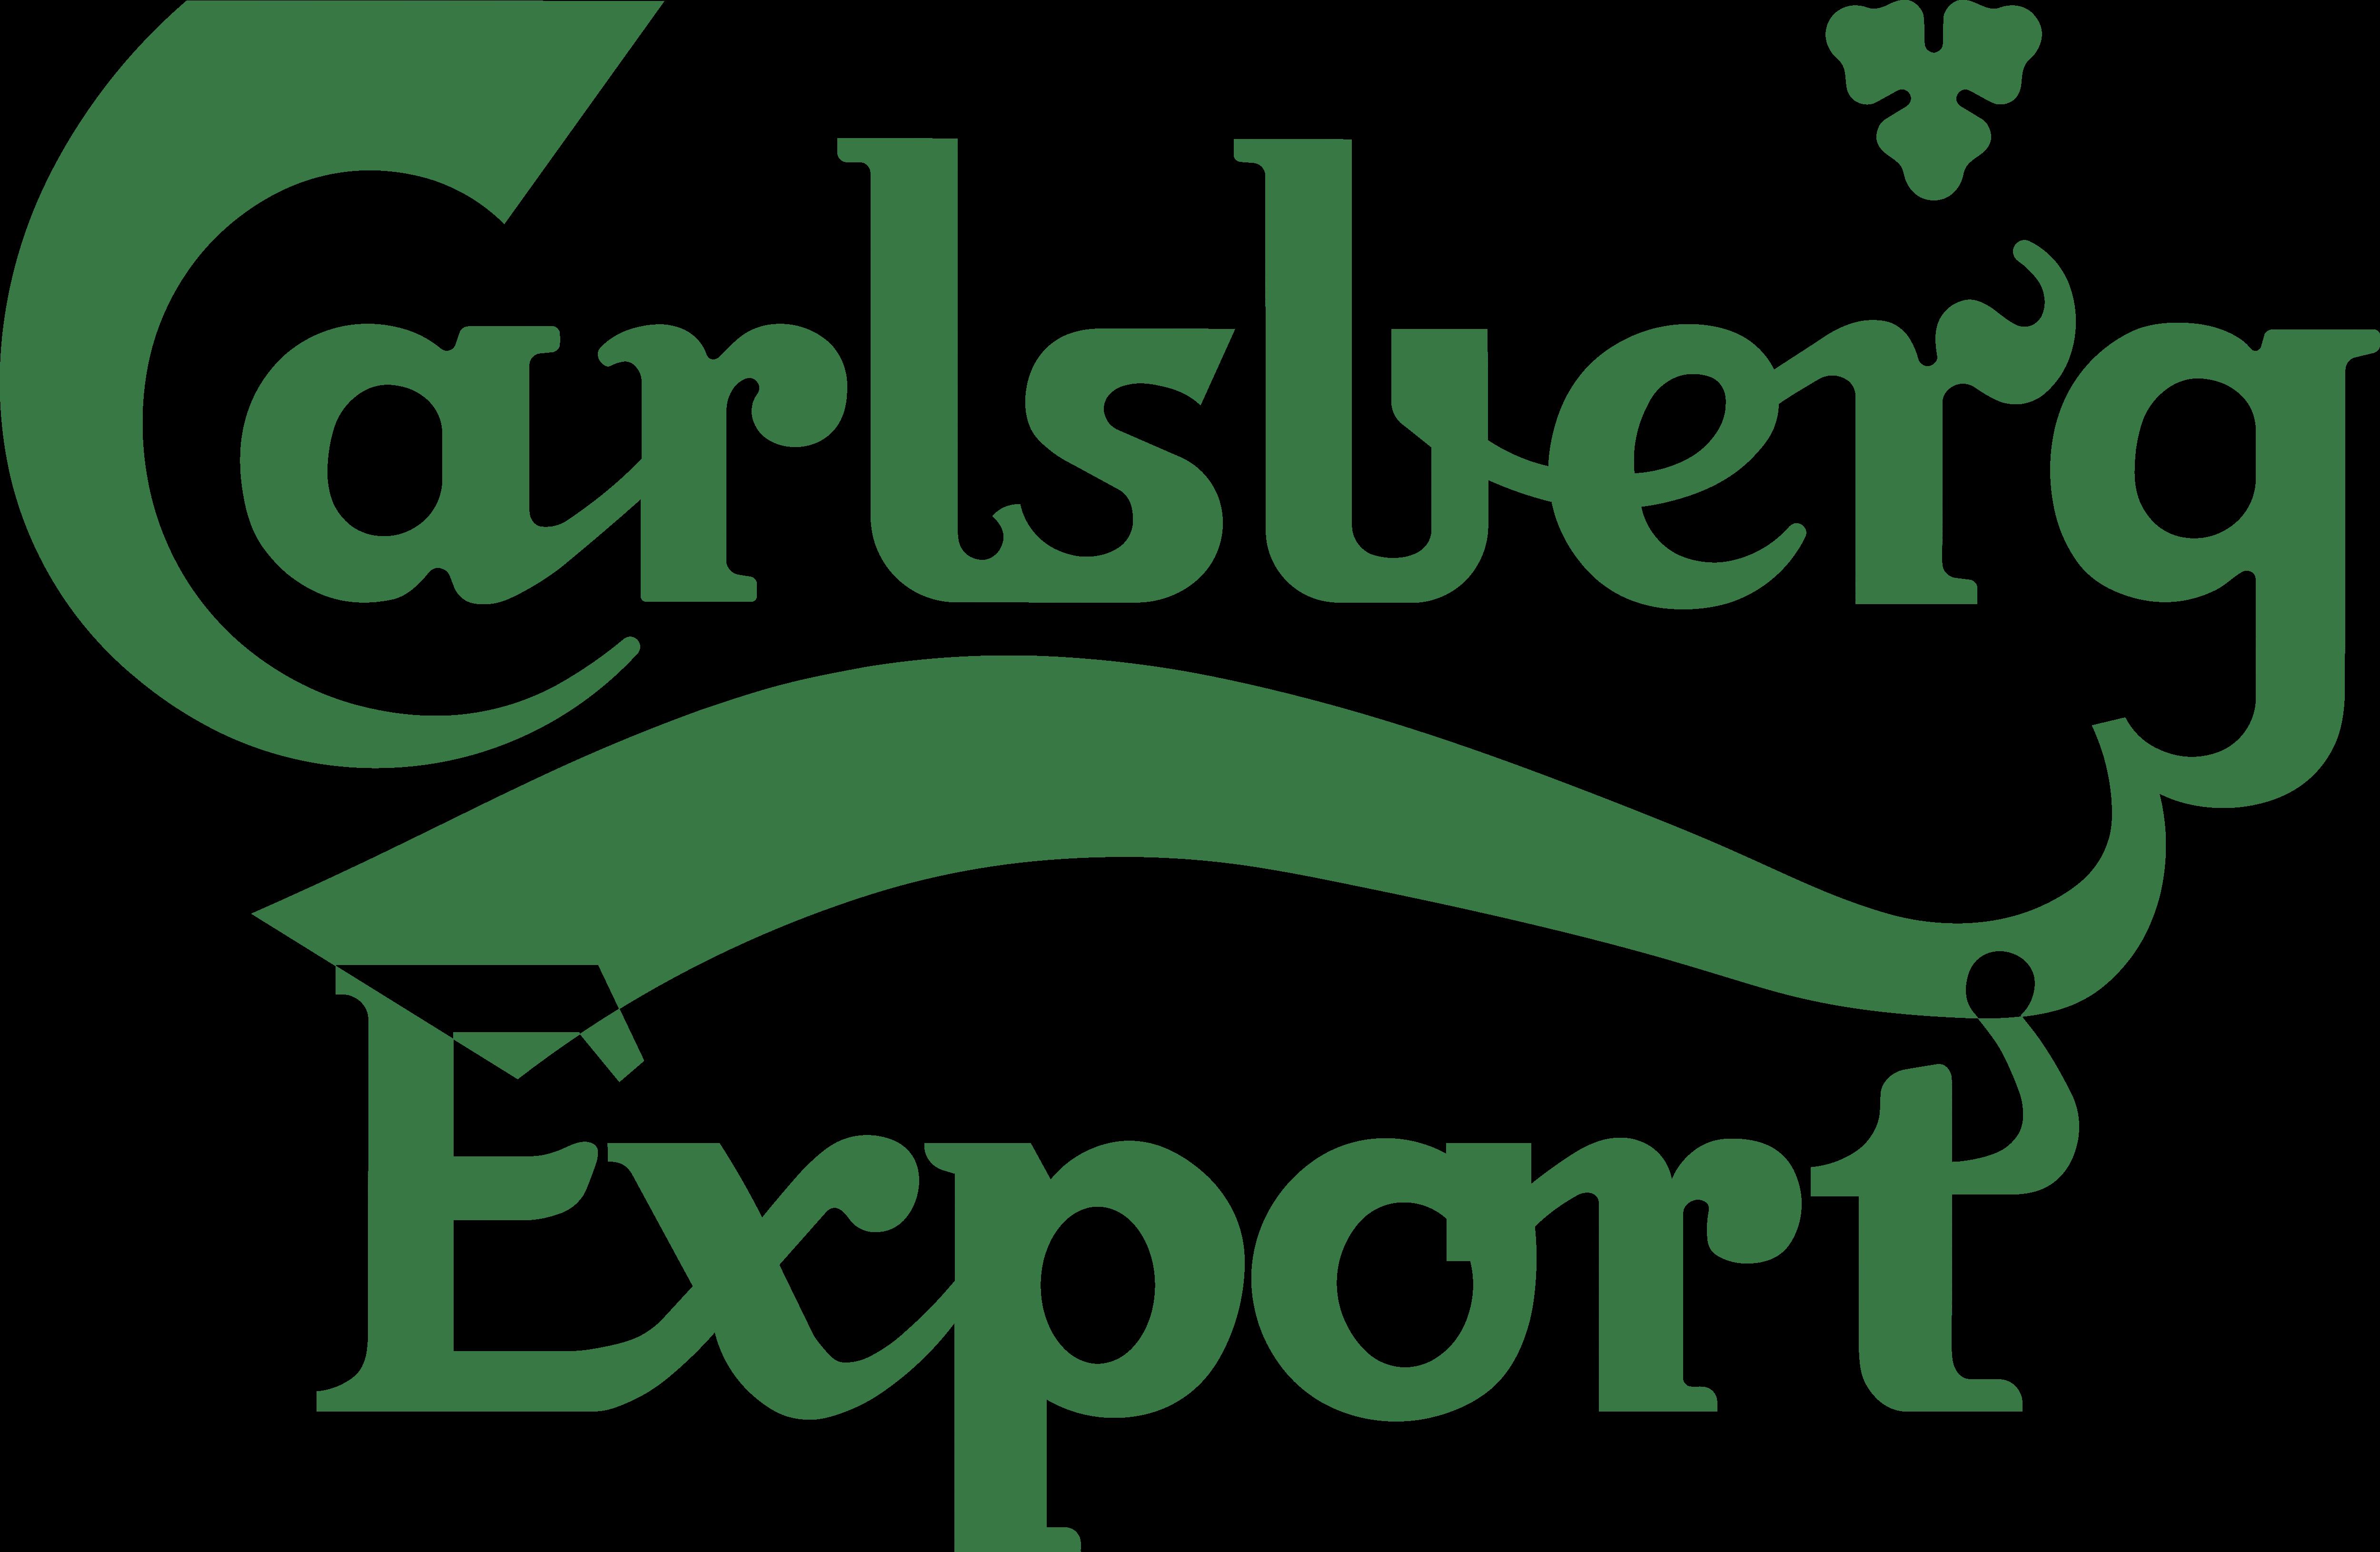 Carlsberg – Logos Download